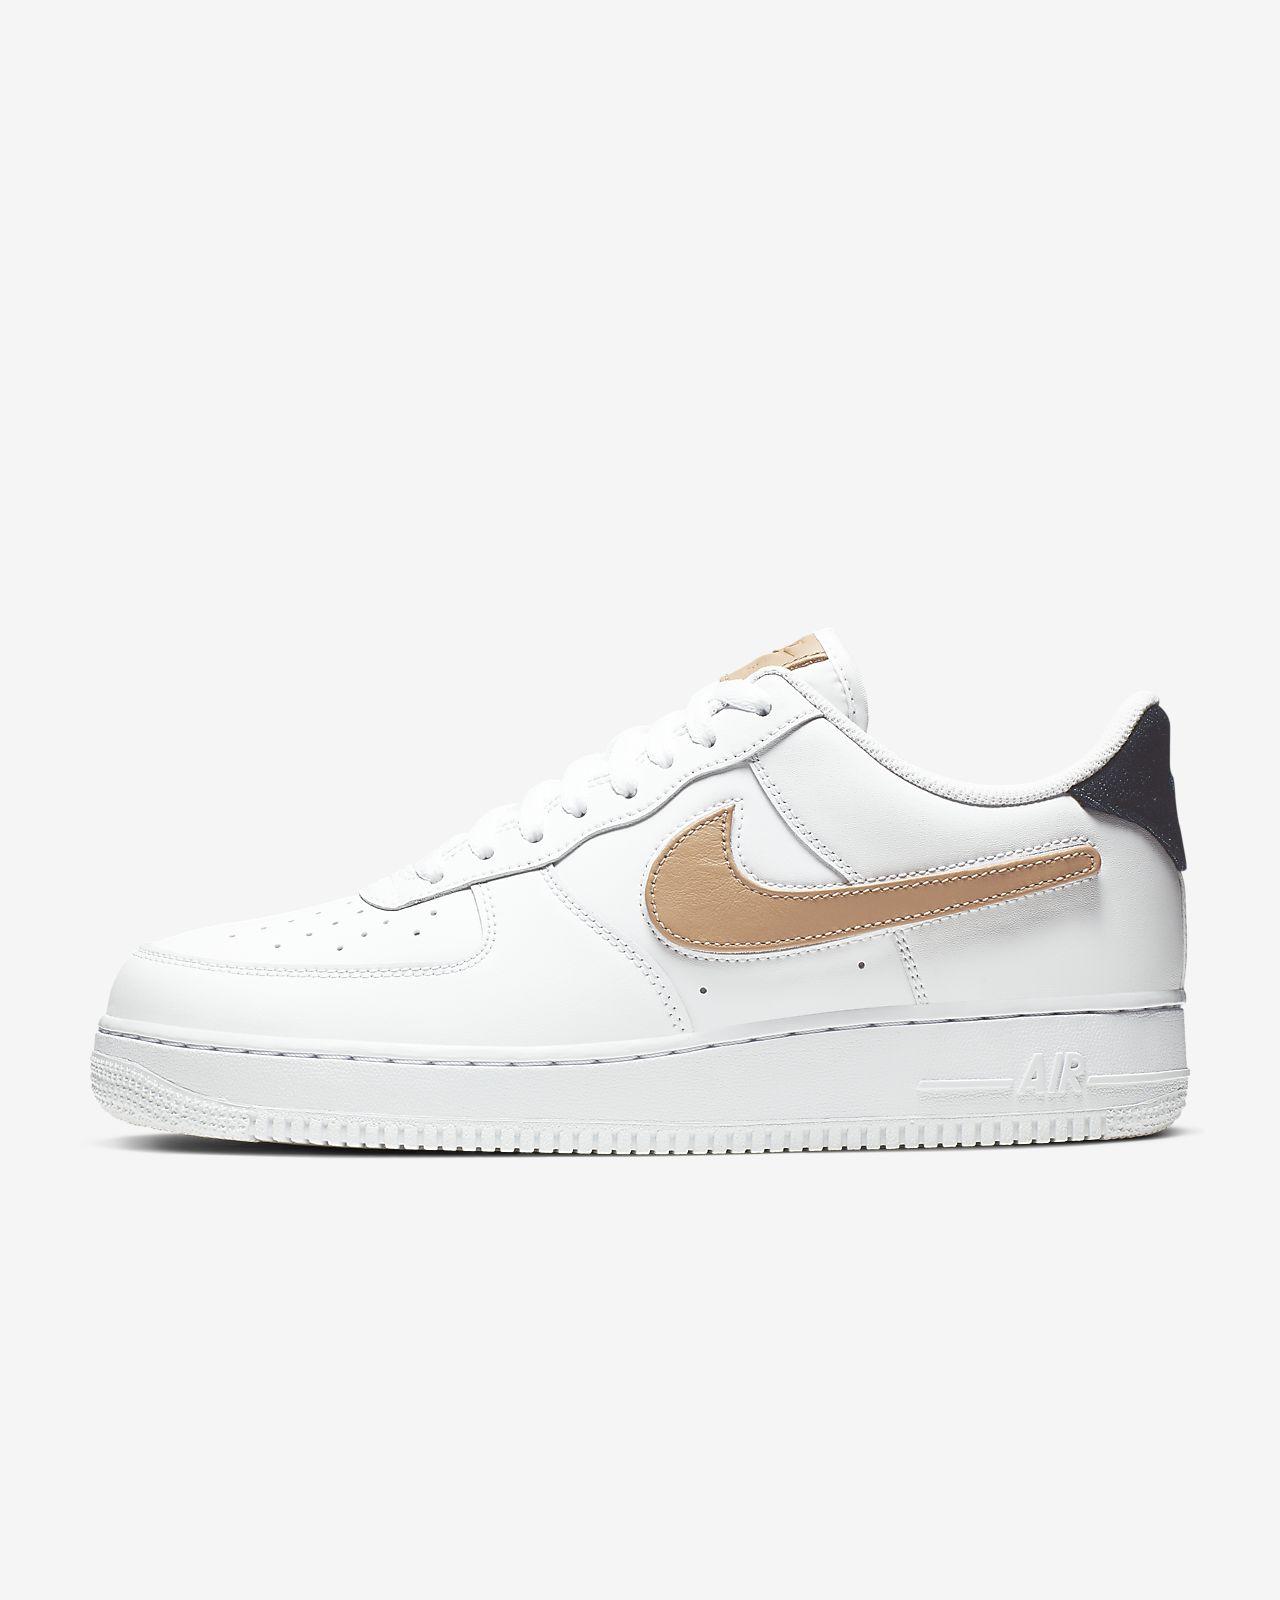 Nike Air Force 1 '07 LV8 3 Removable Swoosh Men's schoen